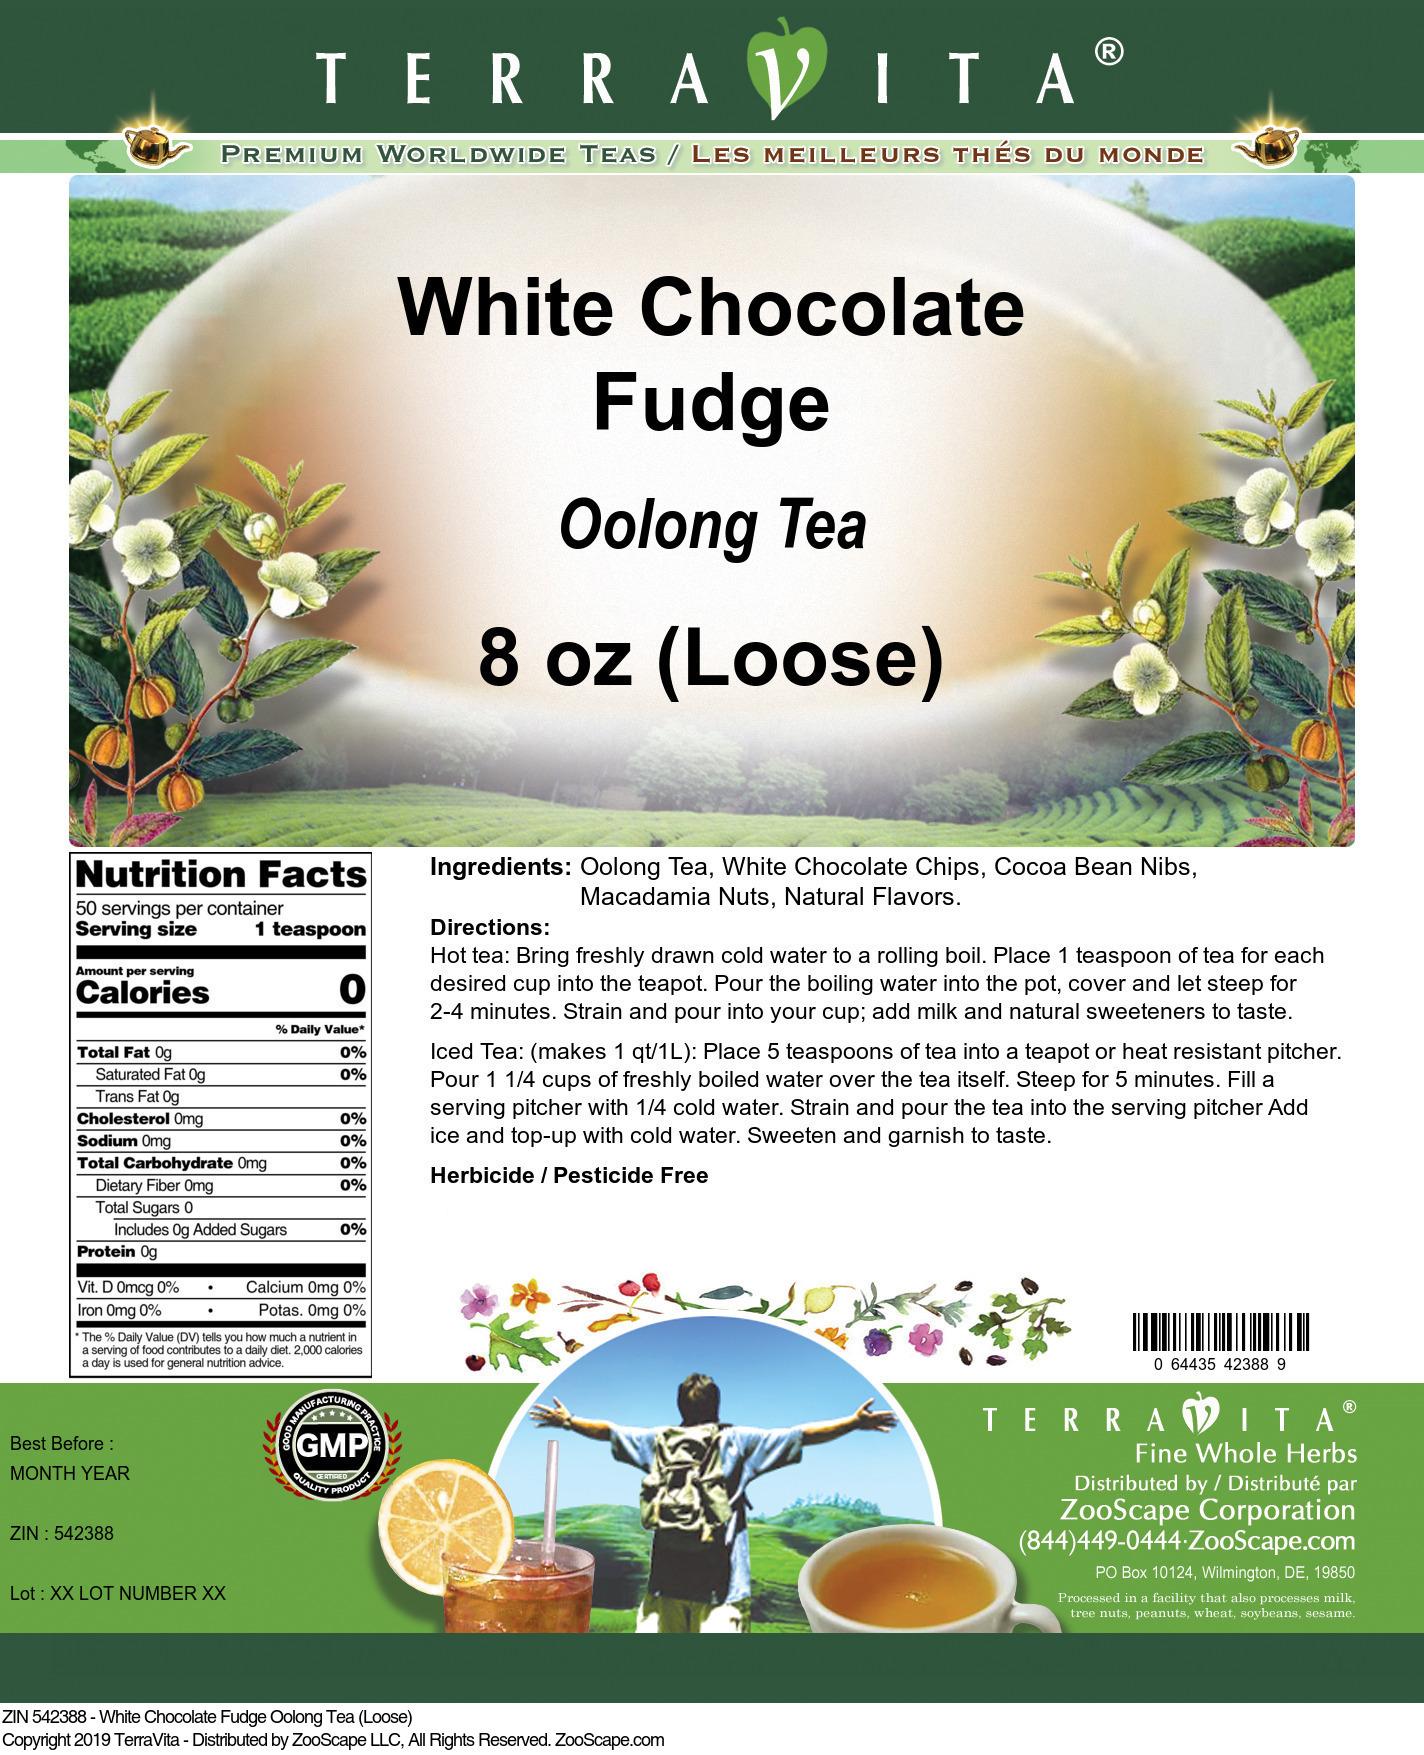 White Chocolate Fudge Oolong Tea (Loose)